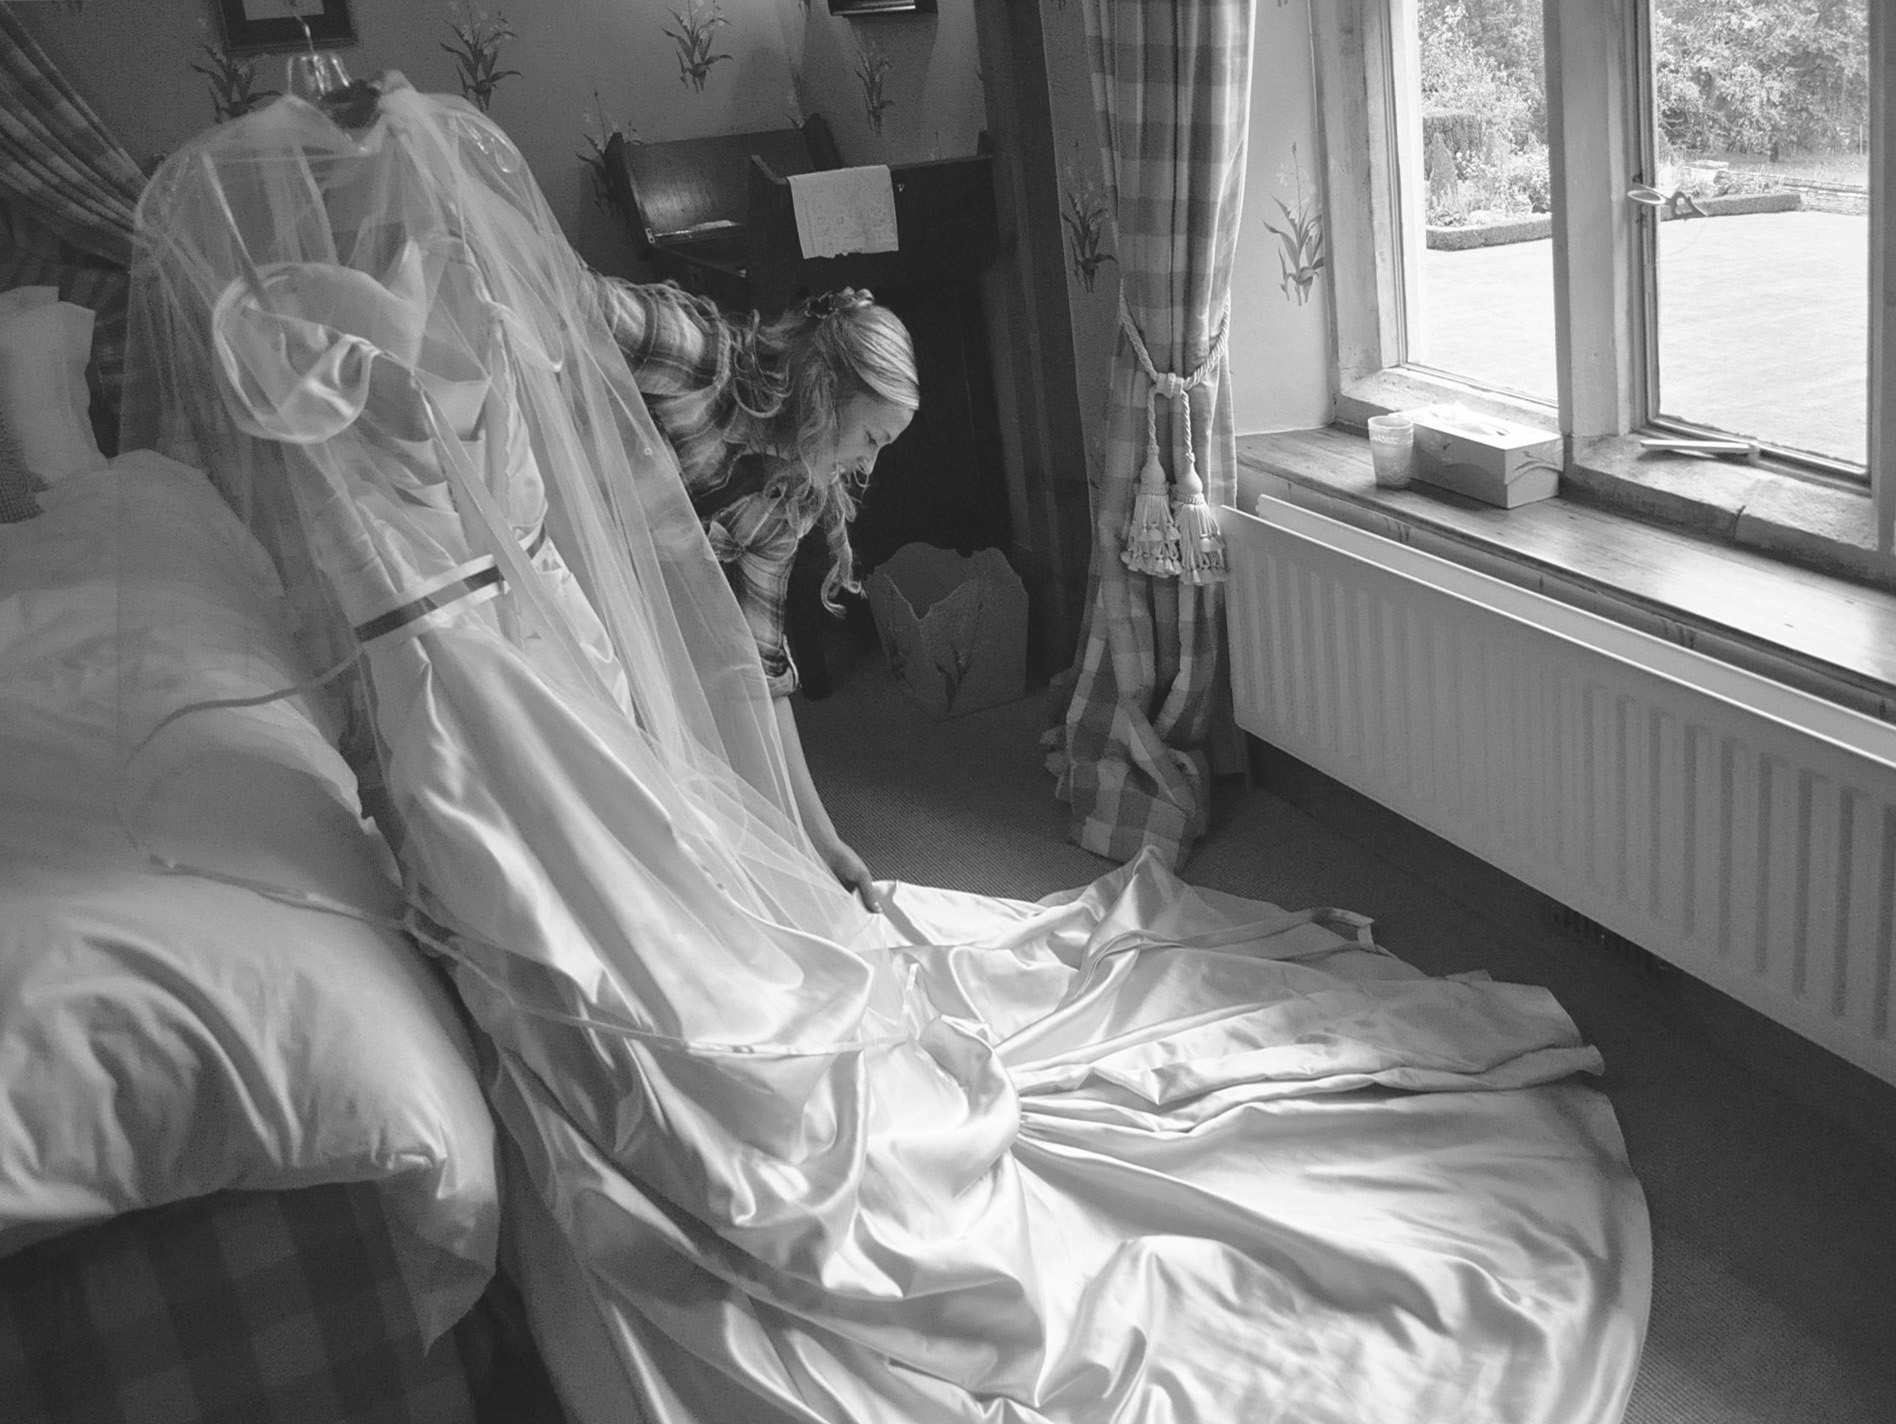 Organising the dress